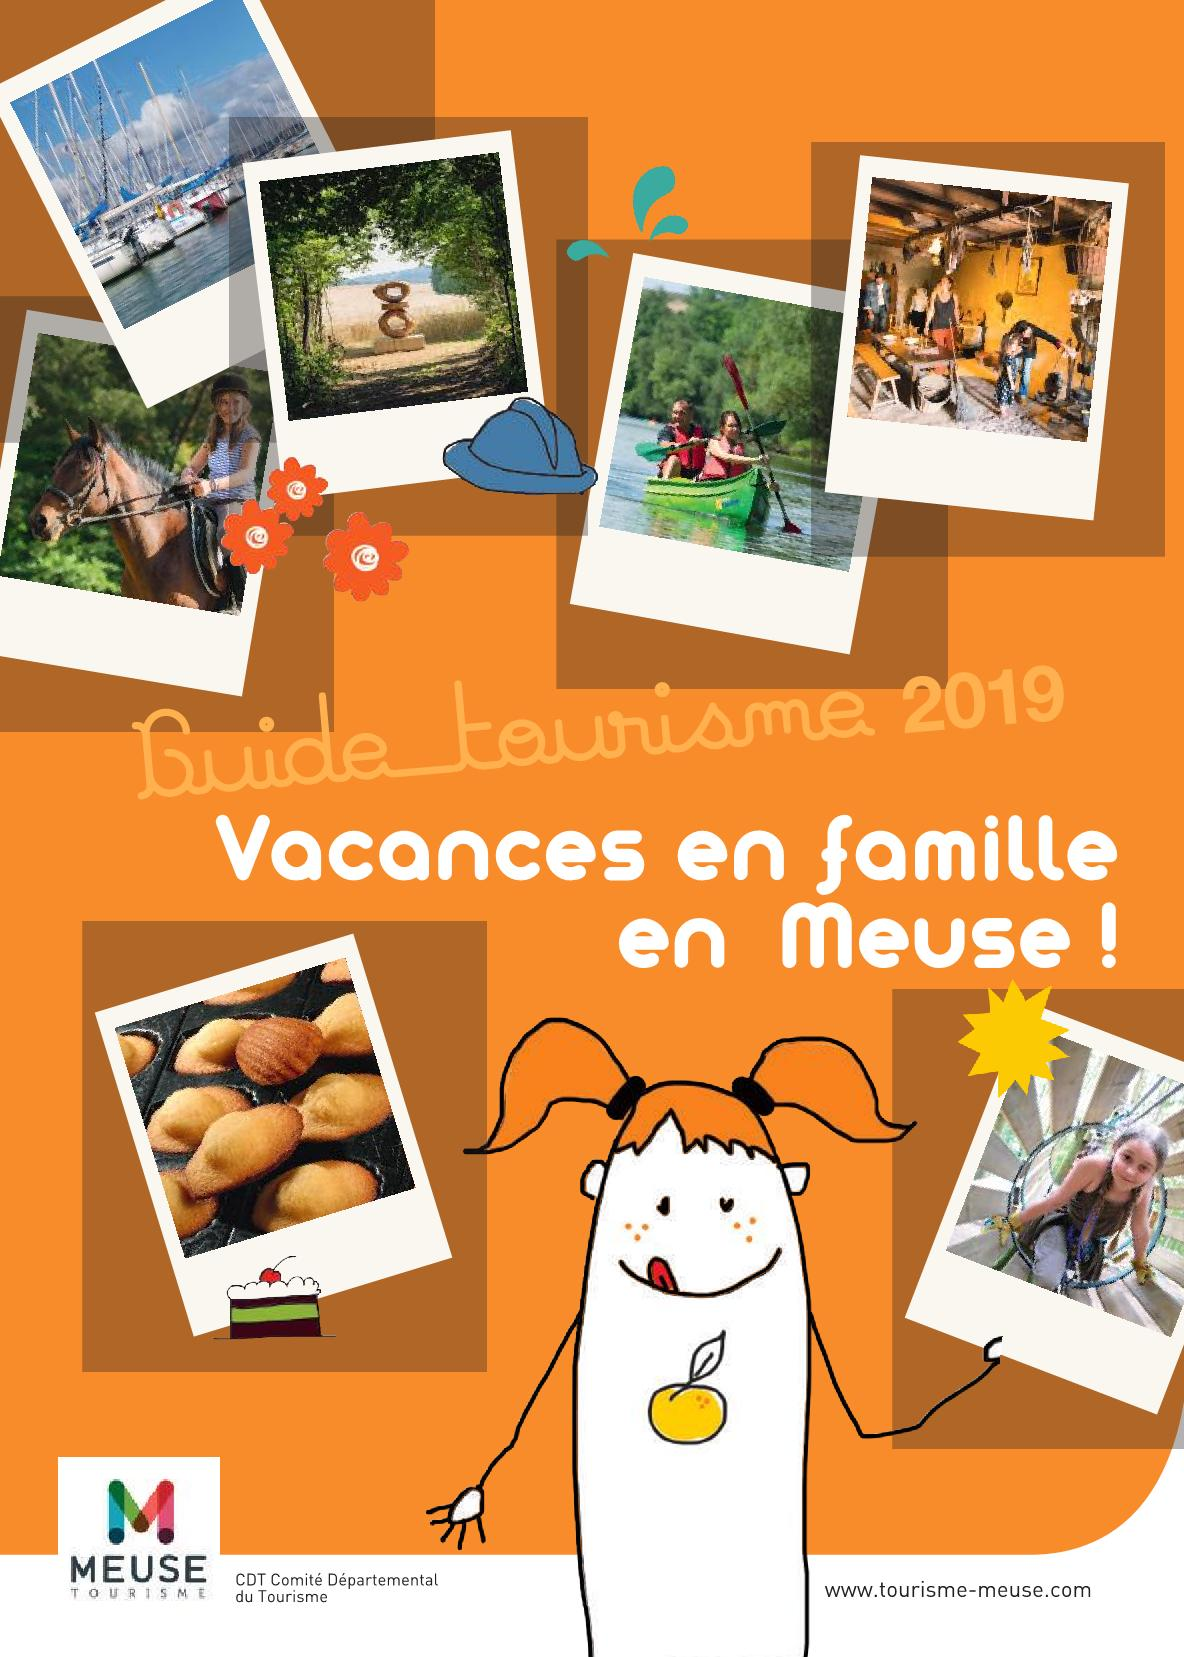 Vacances en Famille en Meuse 2019